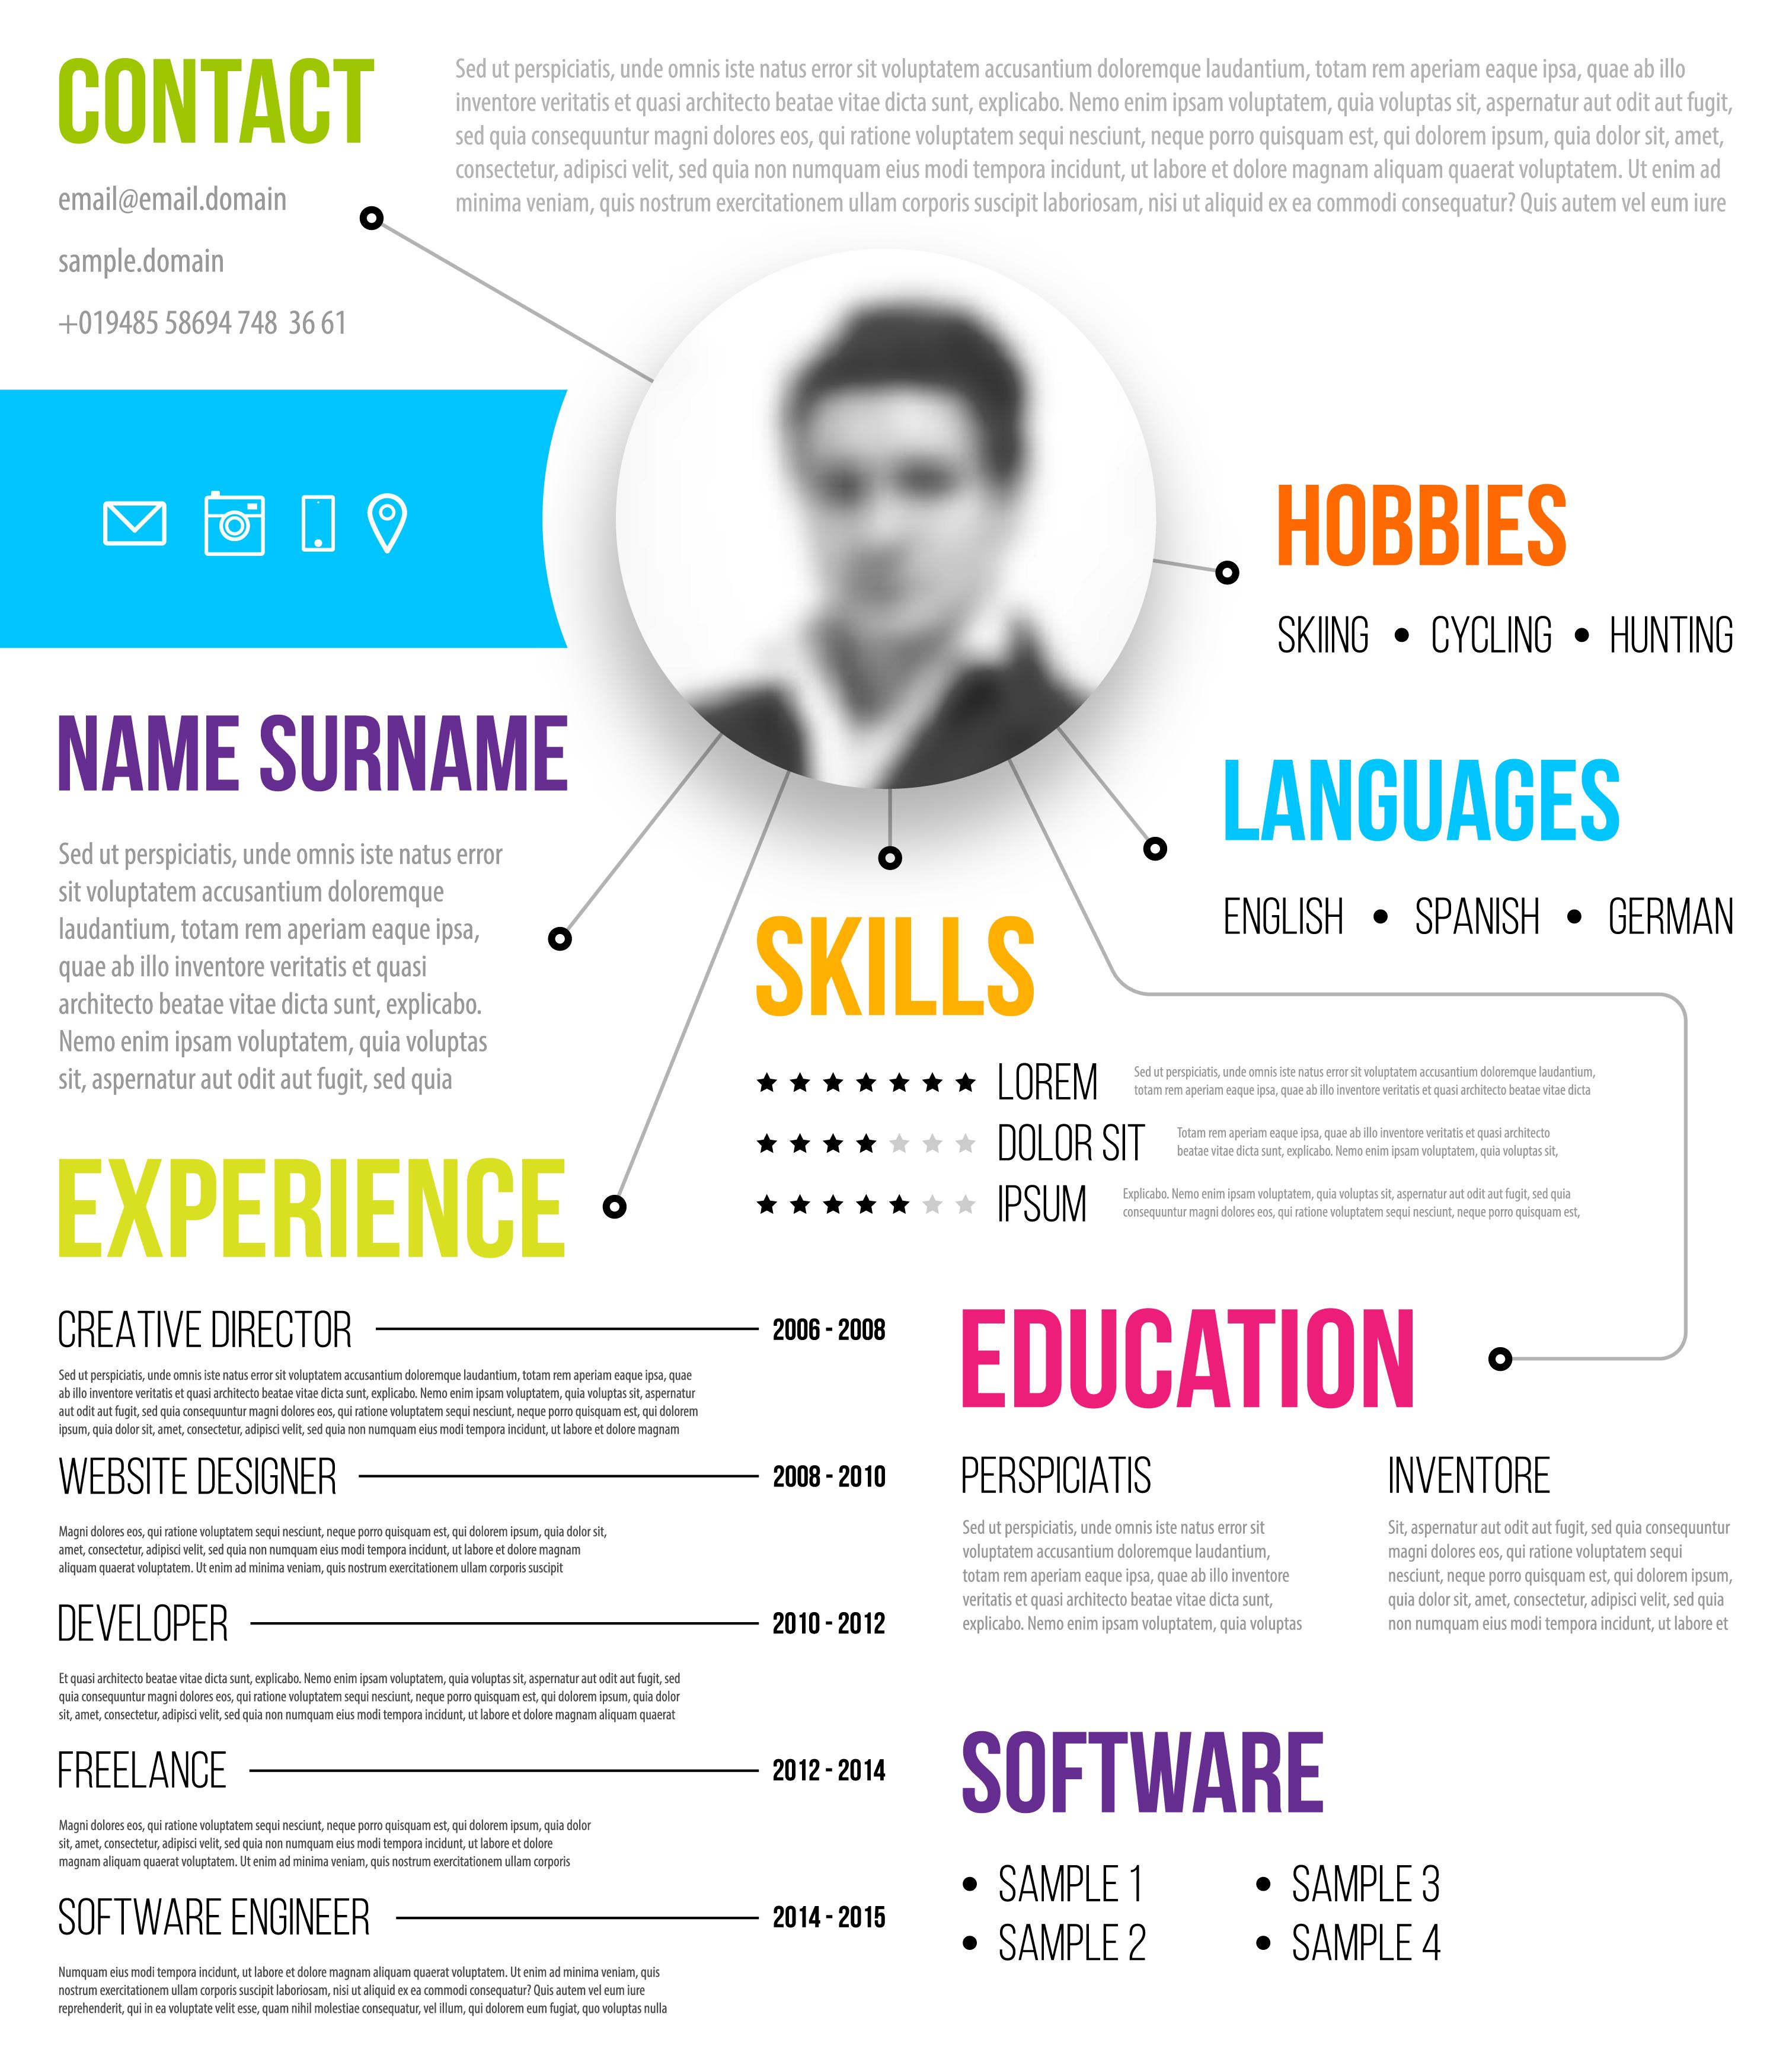 make quick resume online best online resume builder make quick resume online resume templates samples quick easy pongo resume image resume to make